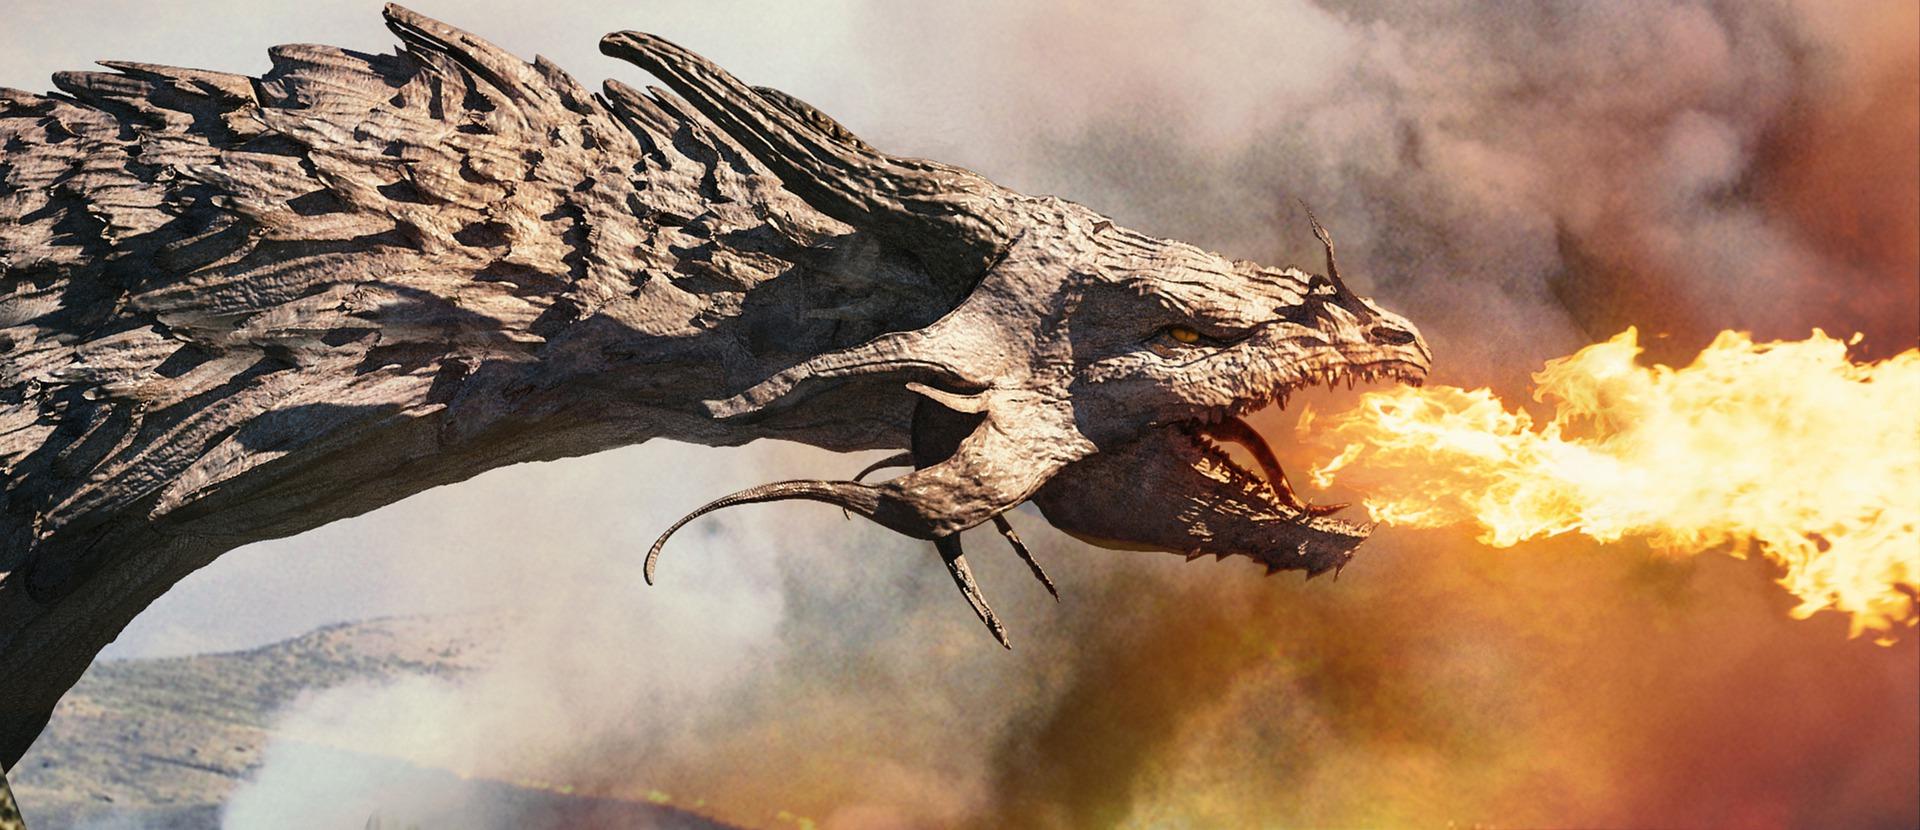 dragon-4758109_1920